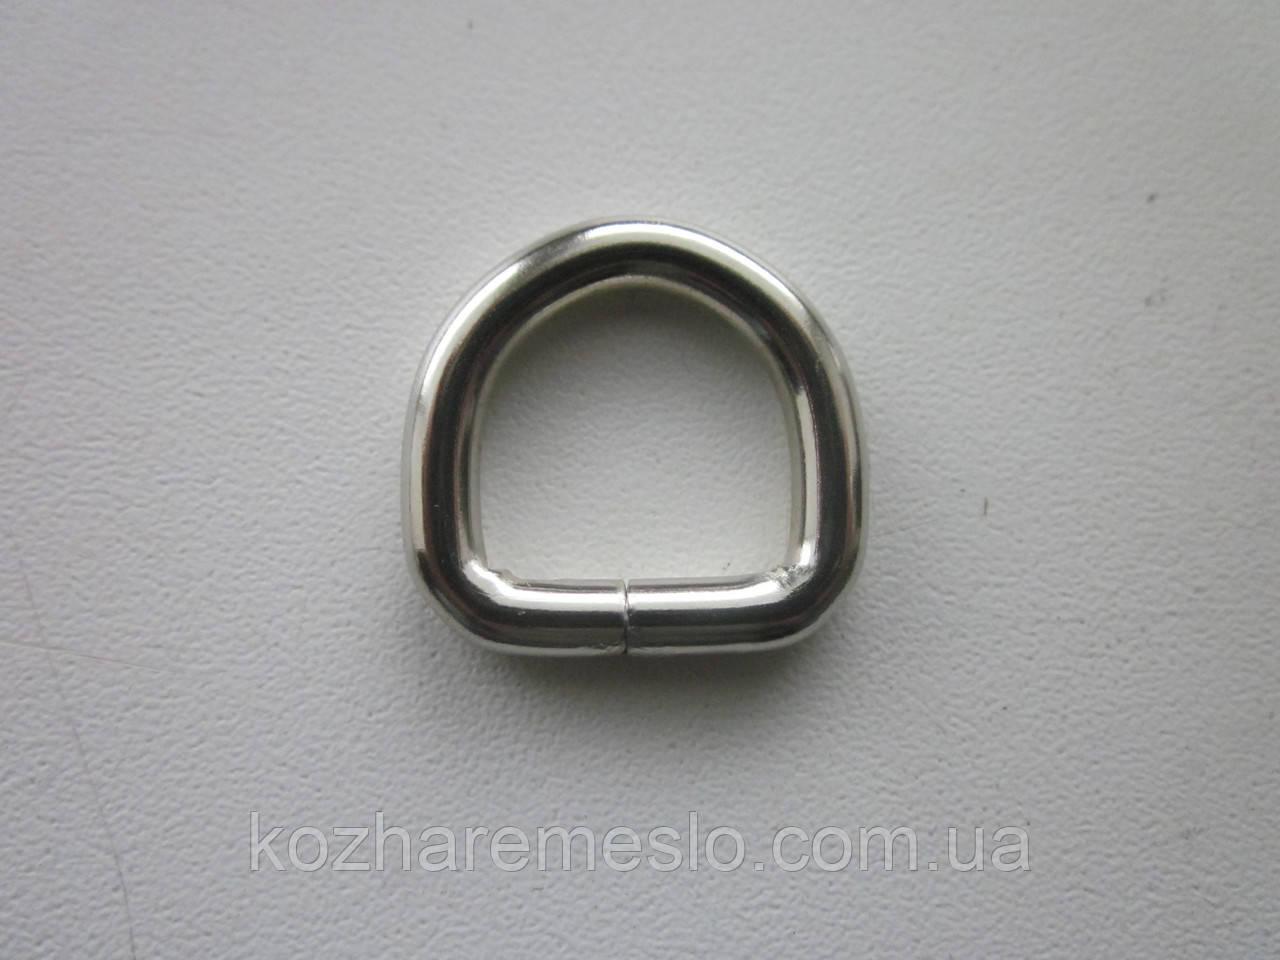 Полукольцо 4 х 15 х 15 мм никель